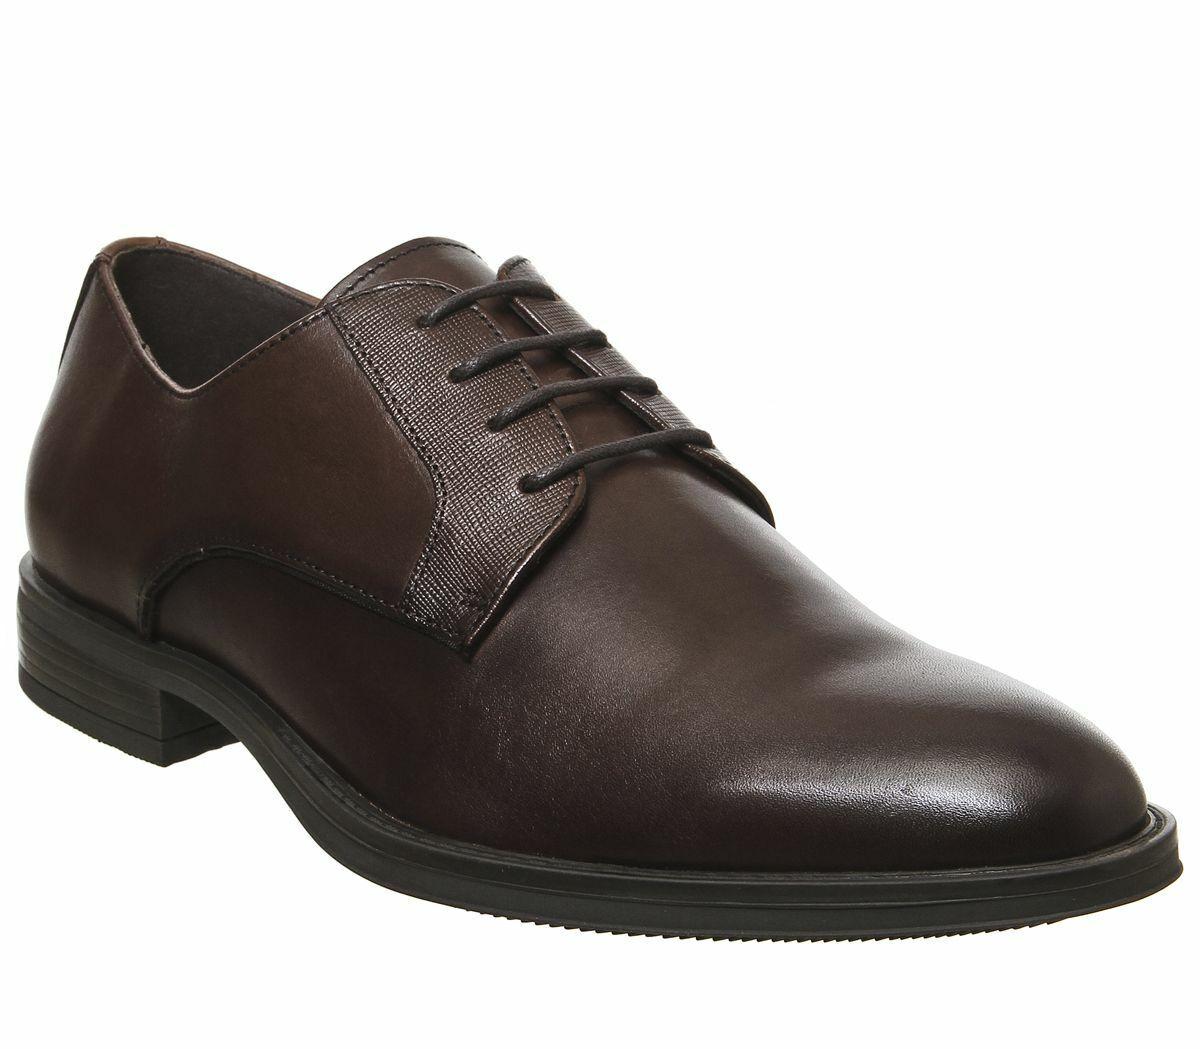 Mens Office Marker Gibson Smart schuhe Choc Leather Formal schuhe